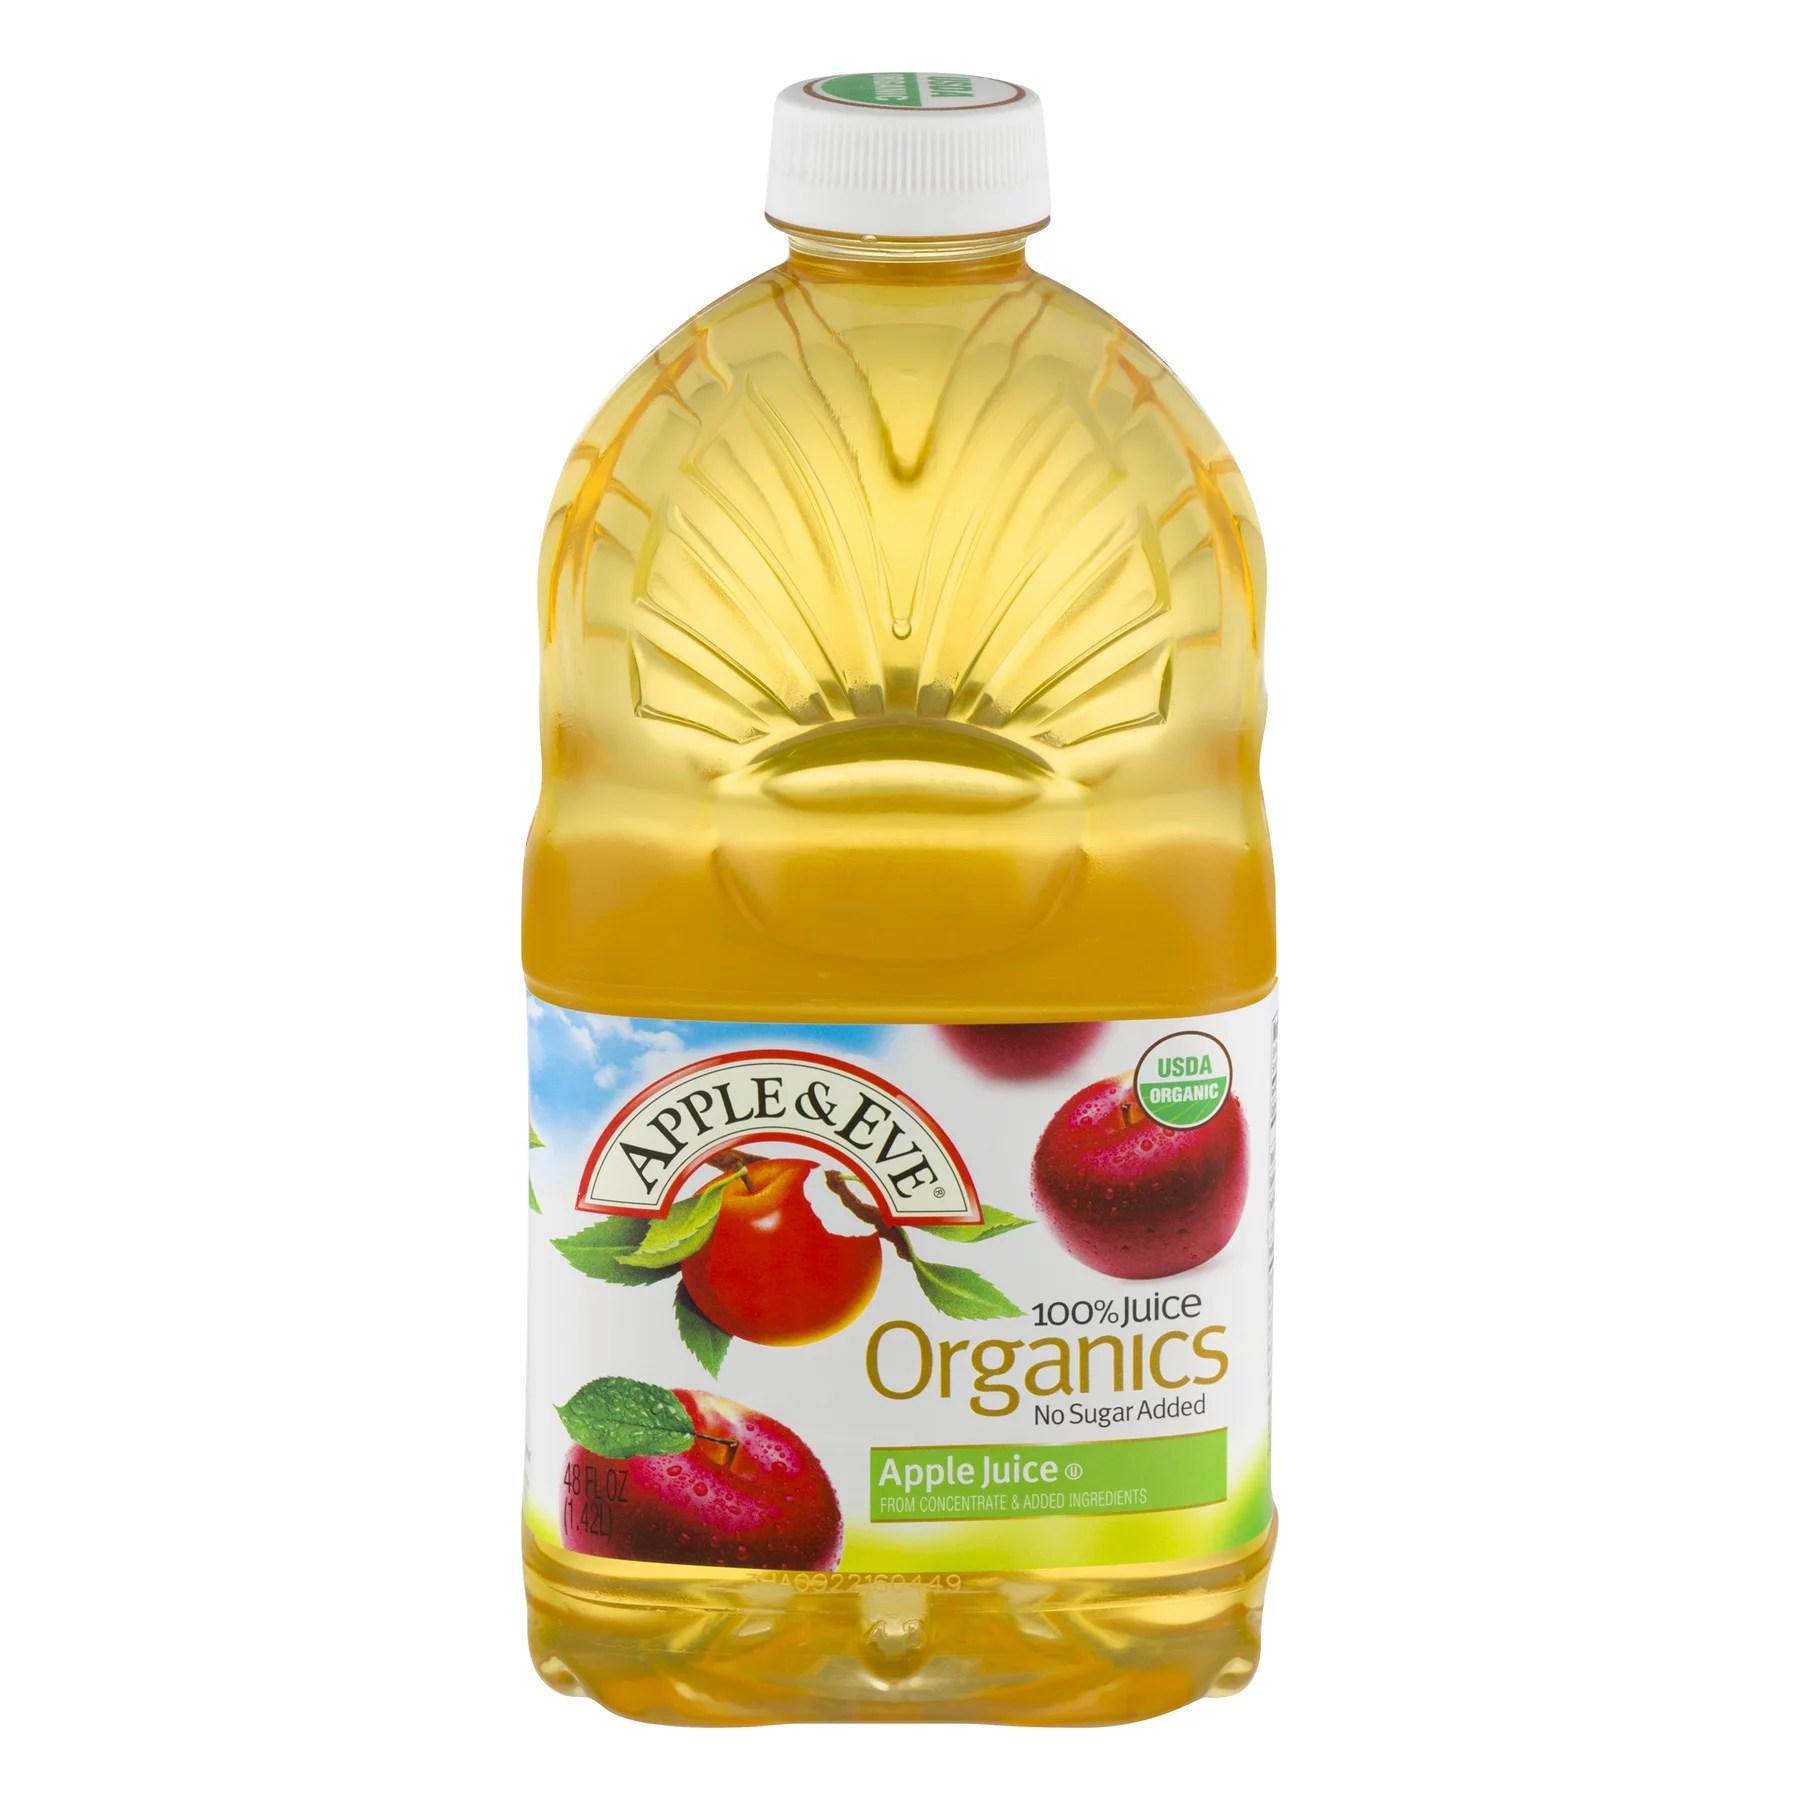 Apple Eve Organics Apple 100 Juice 48 fl oz Bottle